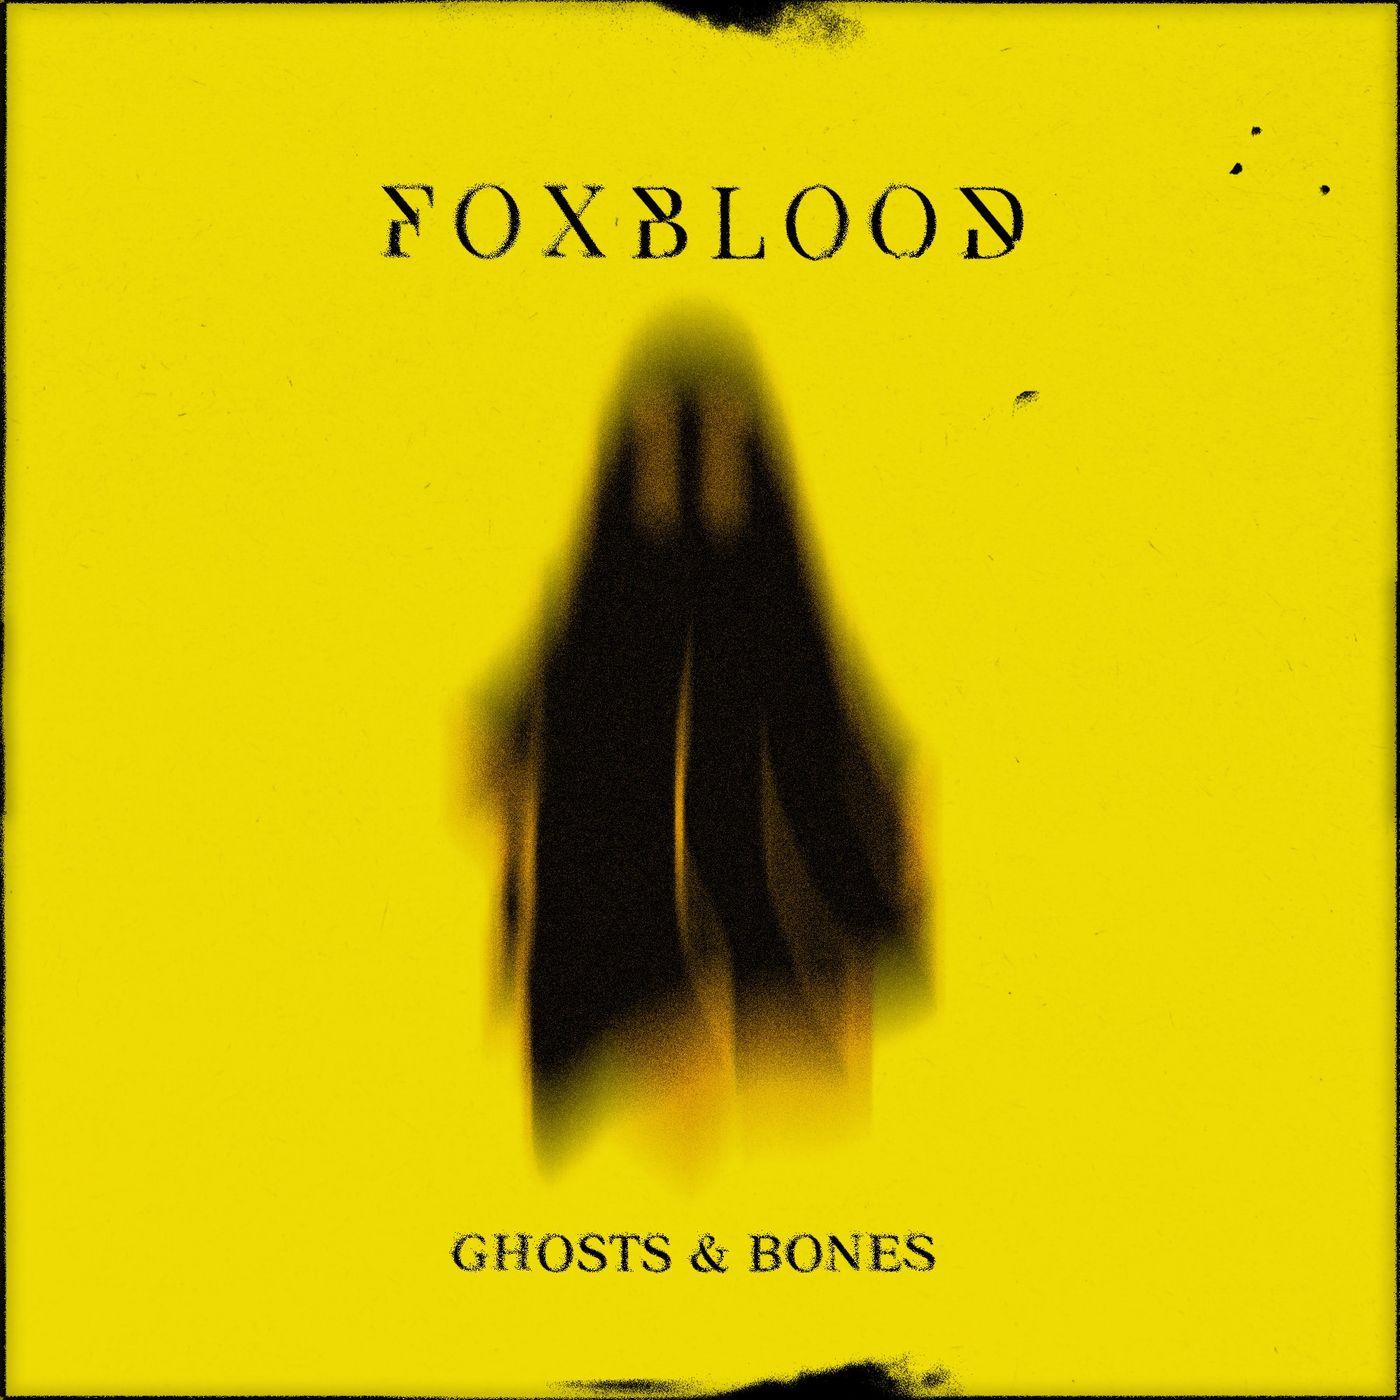 Foxblood - Ghosts & Bones [single] (2020)